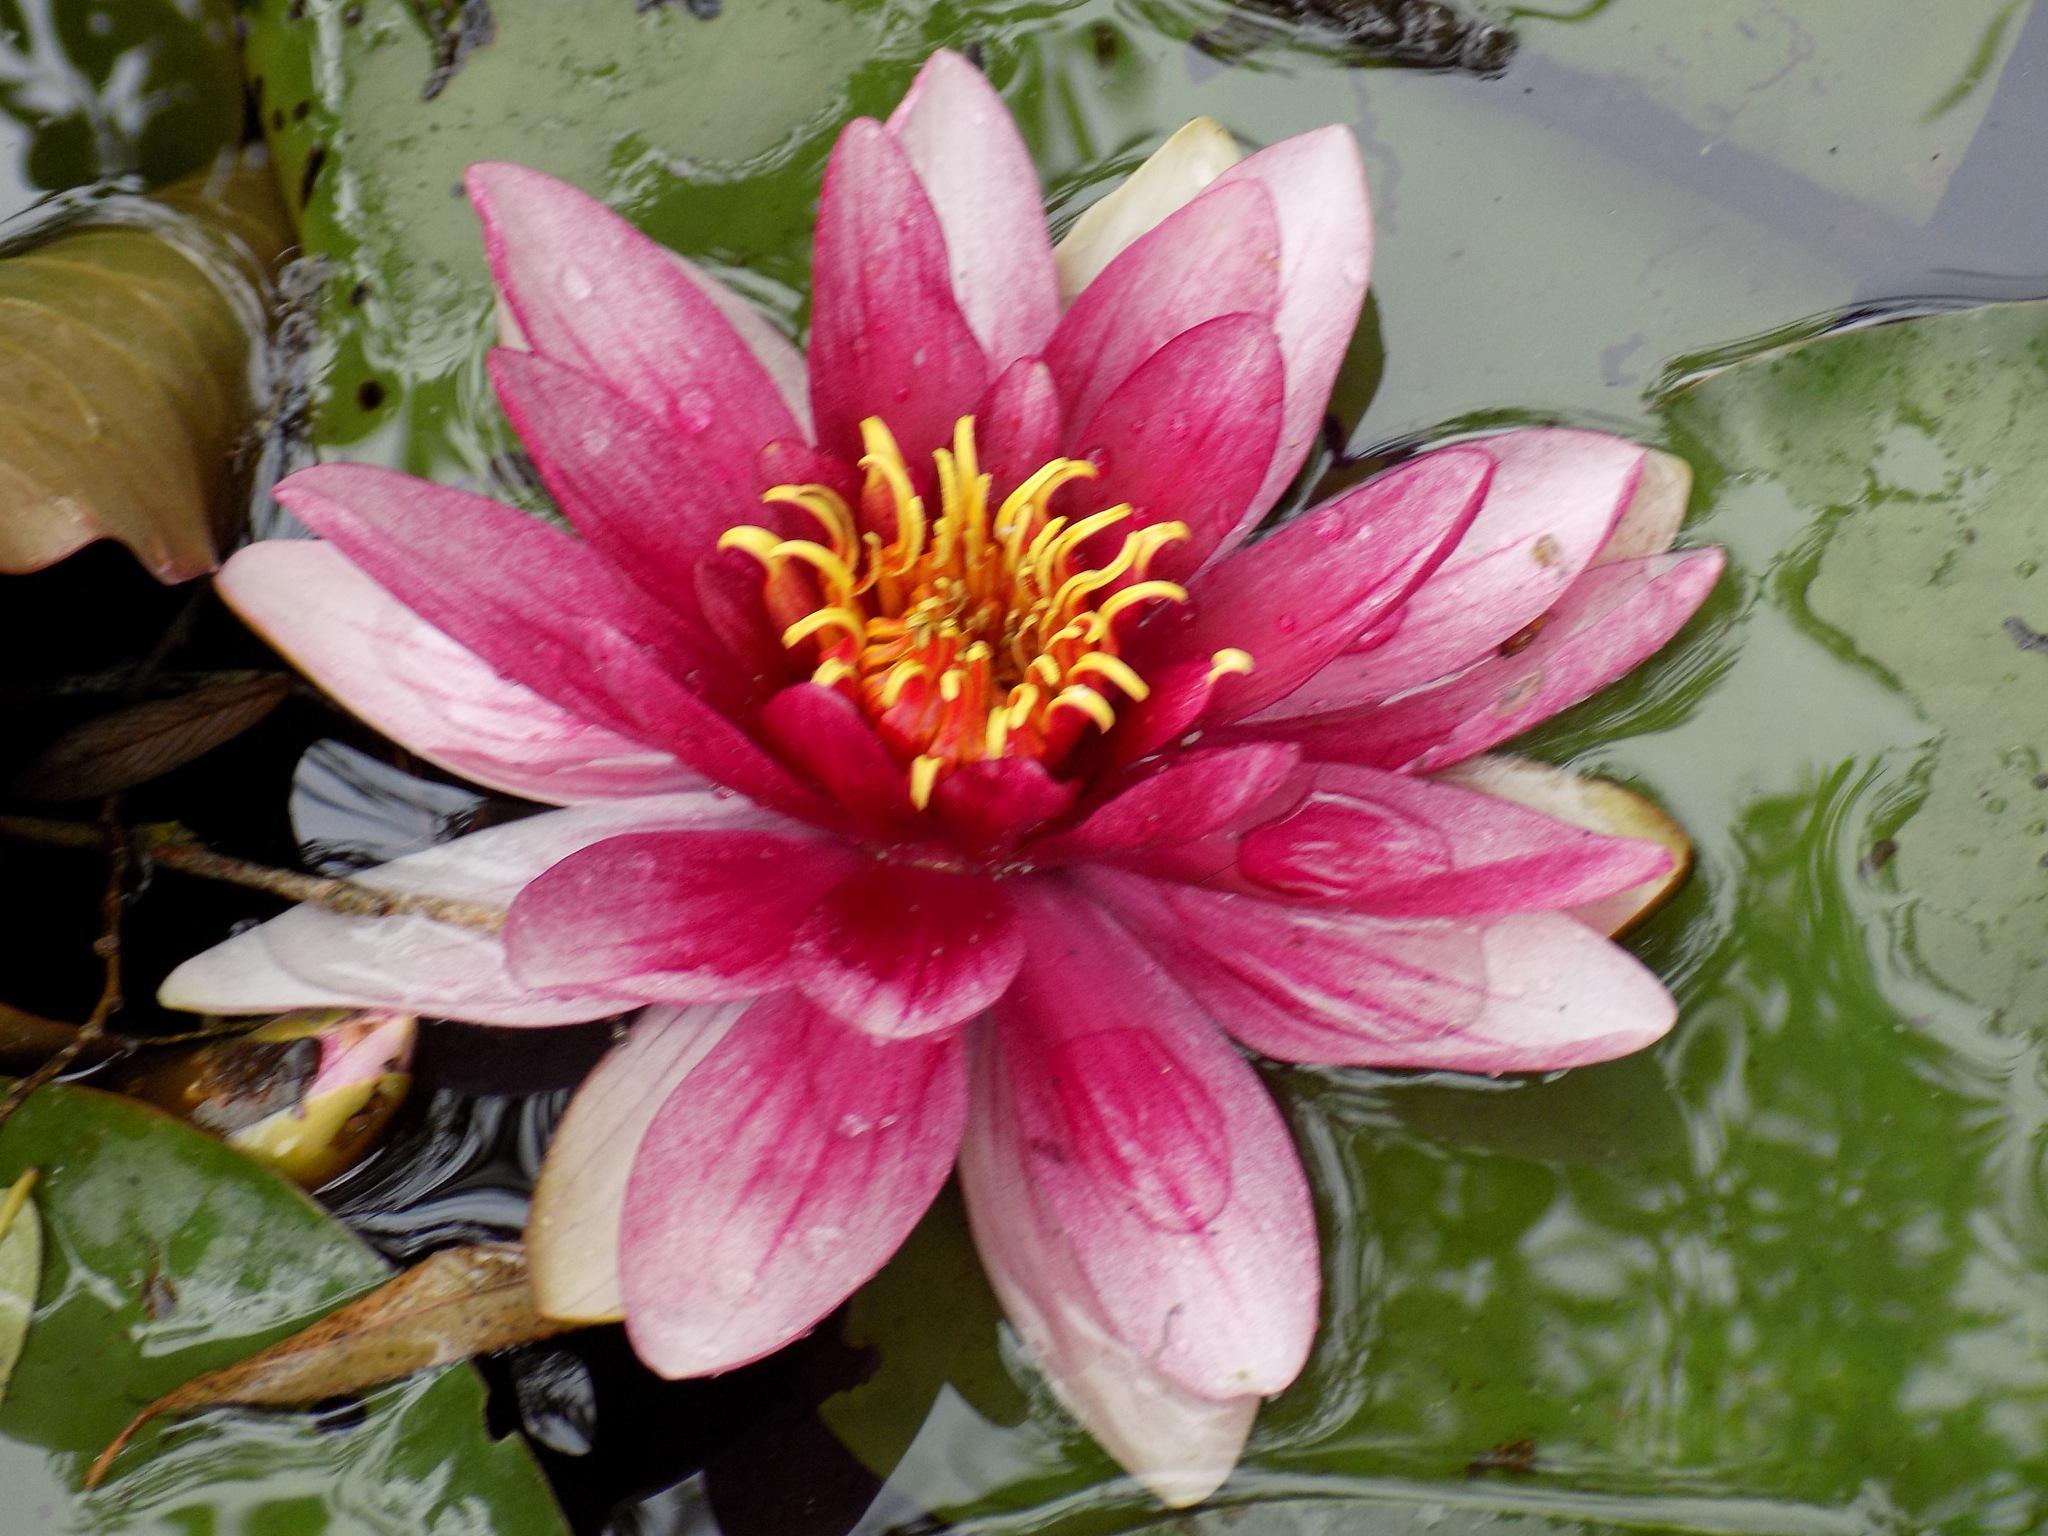 Water lily by uzkuraitiene62